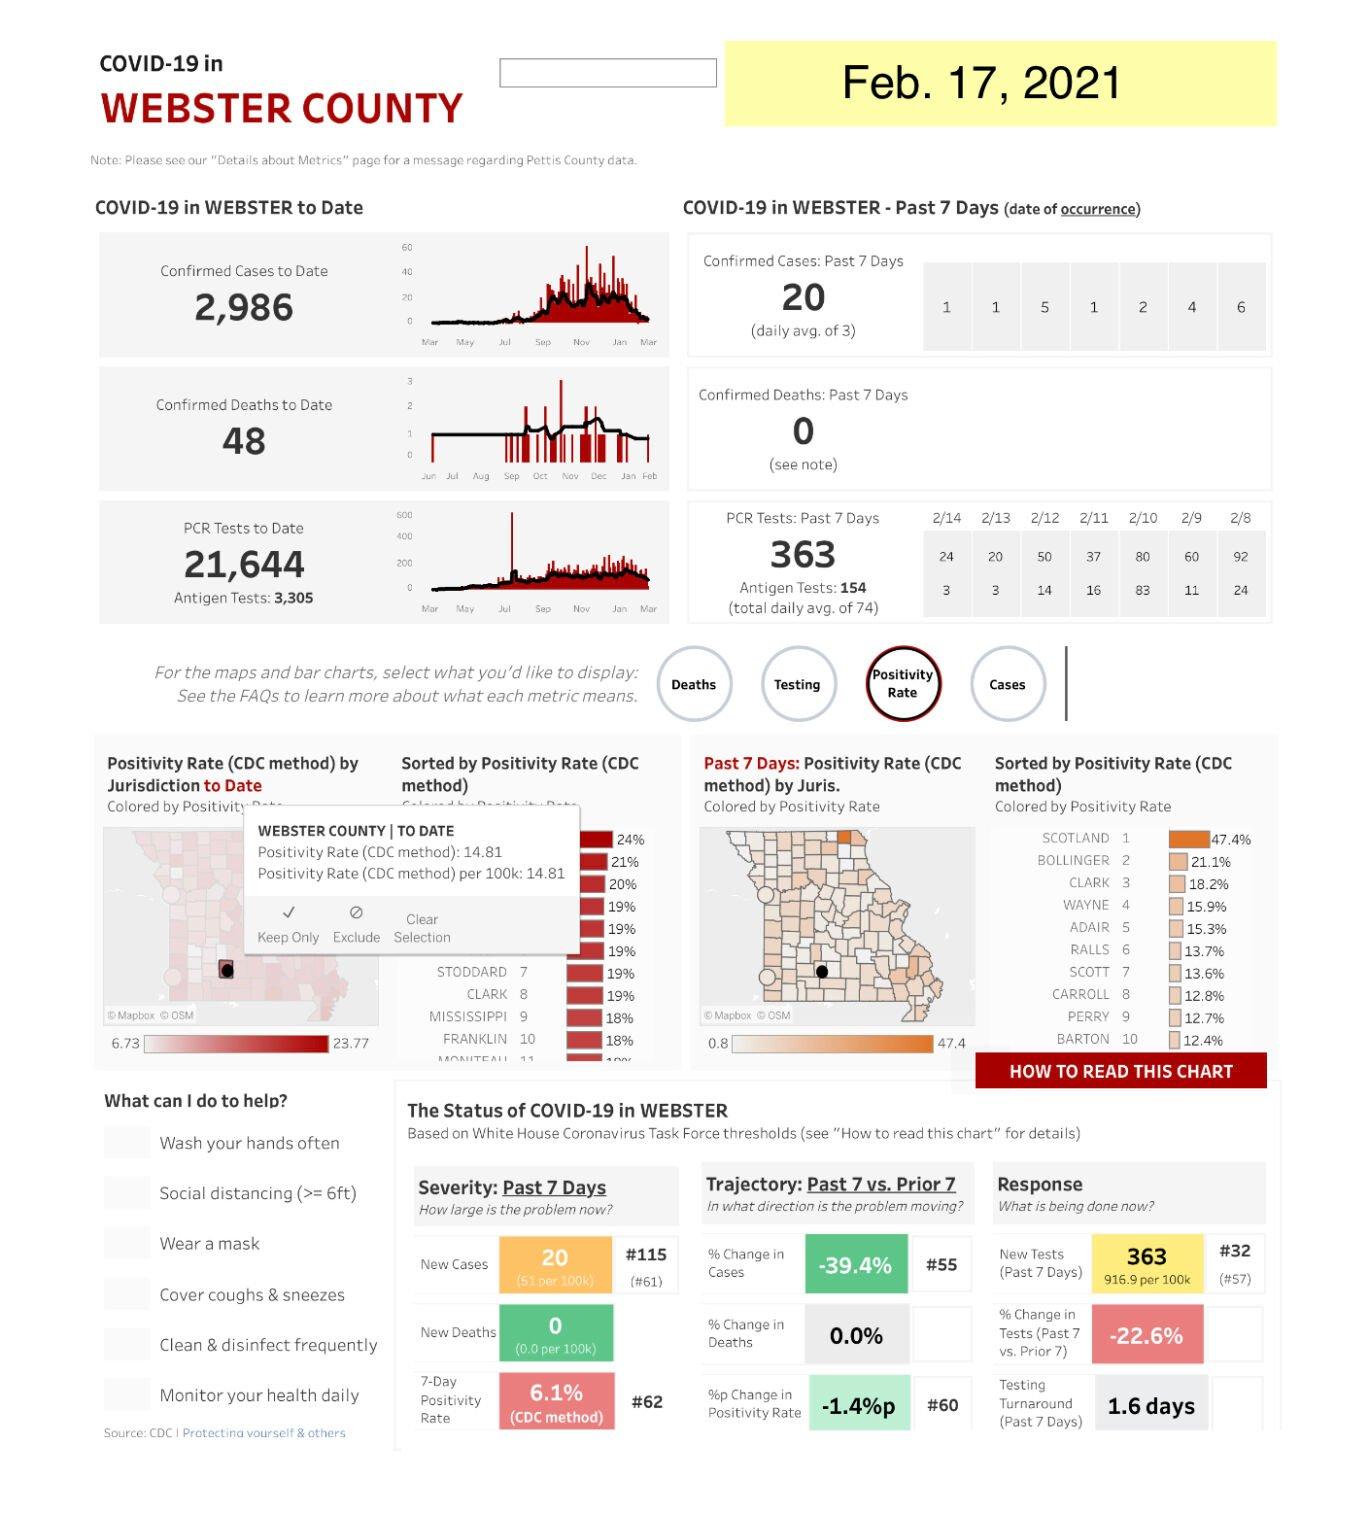 - COVID-19 cases Feb. 17 Web. Co. Mo. State